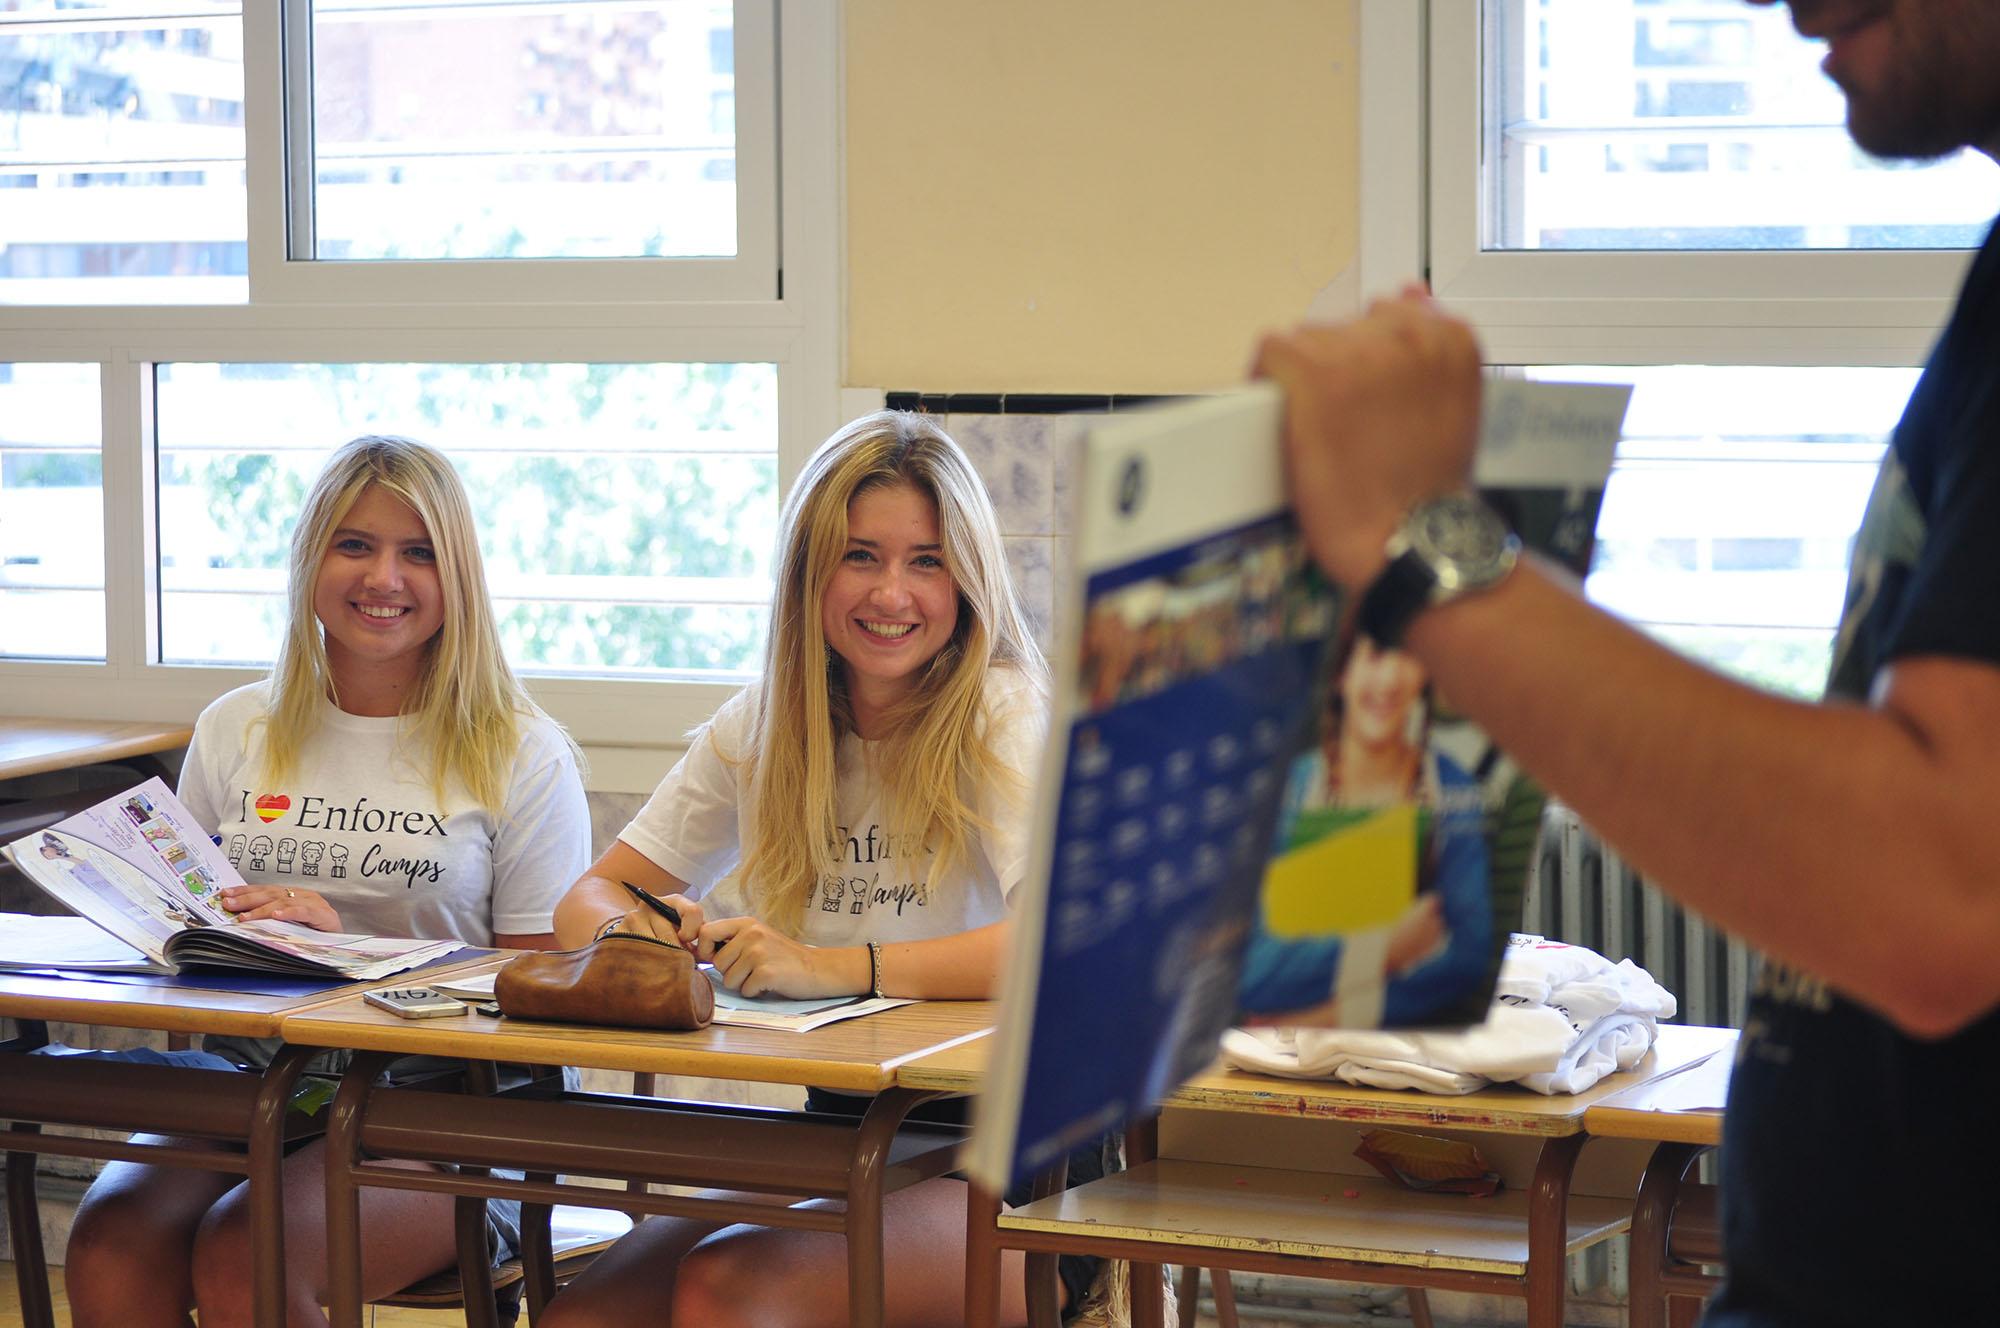 Enforex-Camps-Barcelona-yurtdisi-egitim-dil-okulu-3.JPG